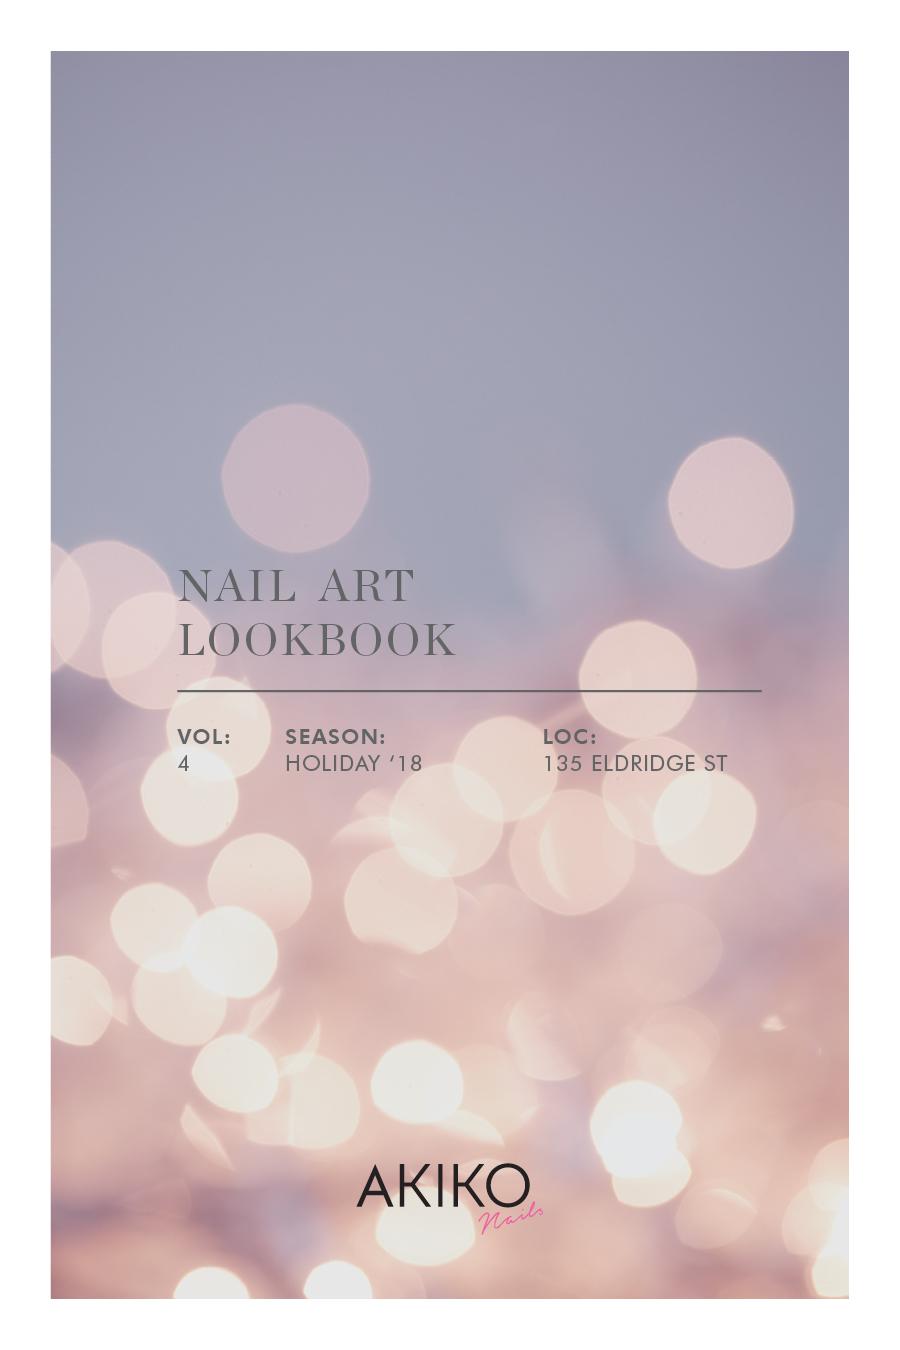 Akiko Nails holiday lookbook_final.jpg